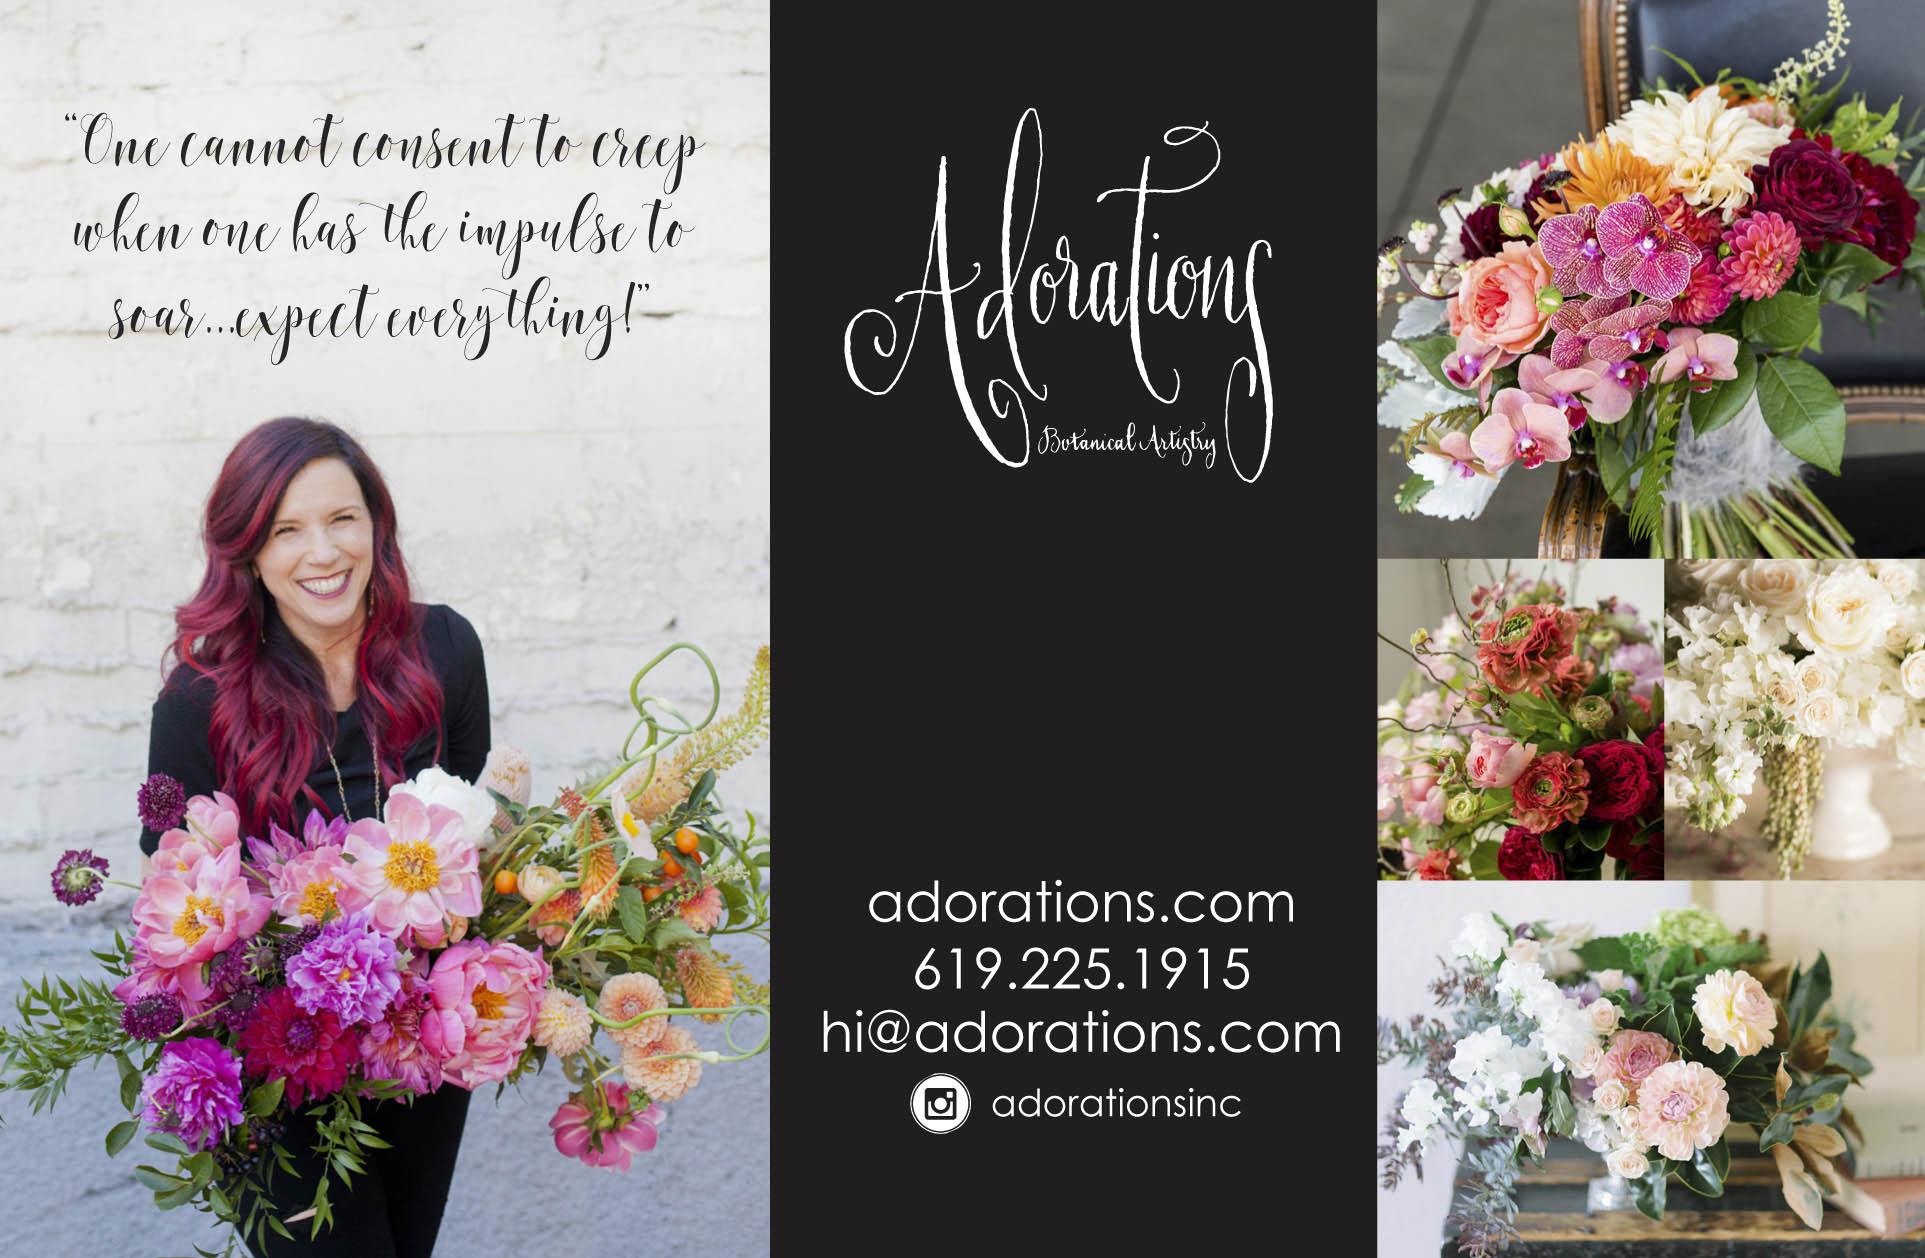 Adorations_halfpage Ad.jpg